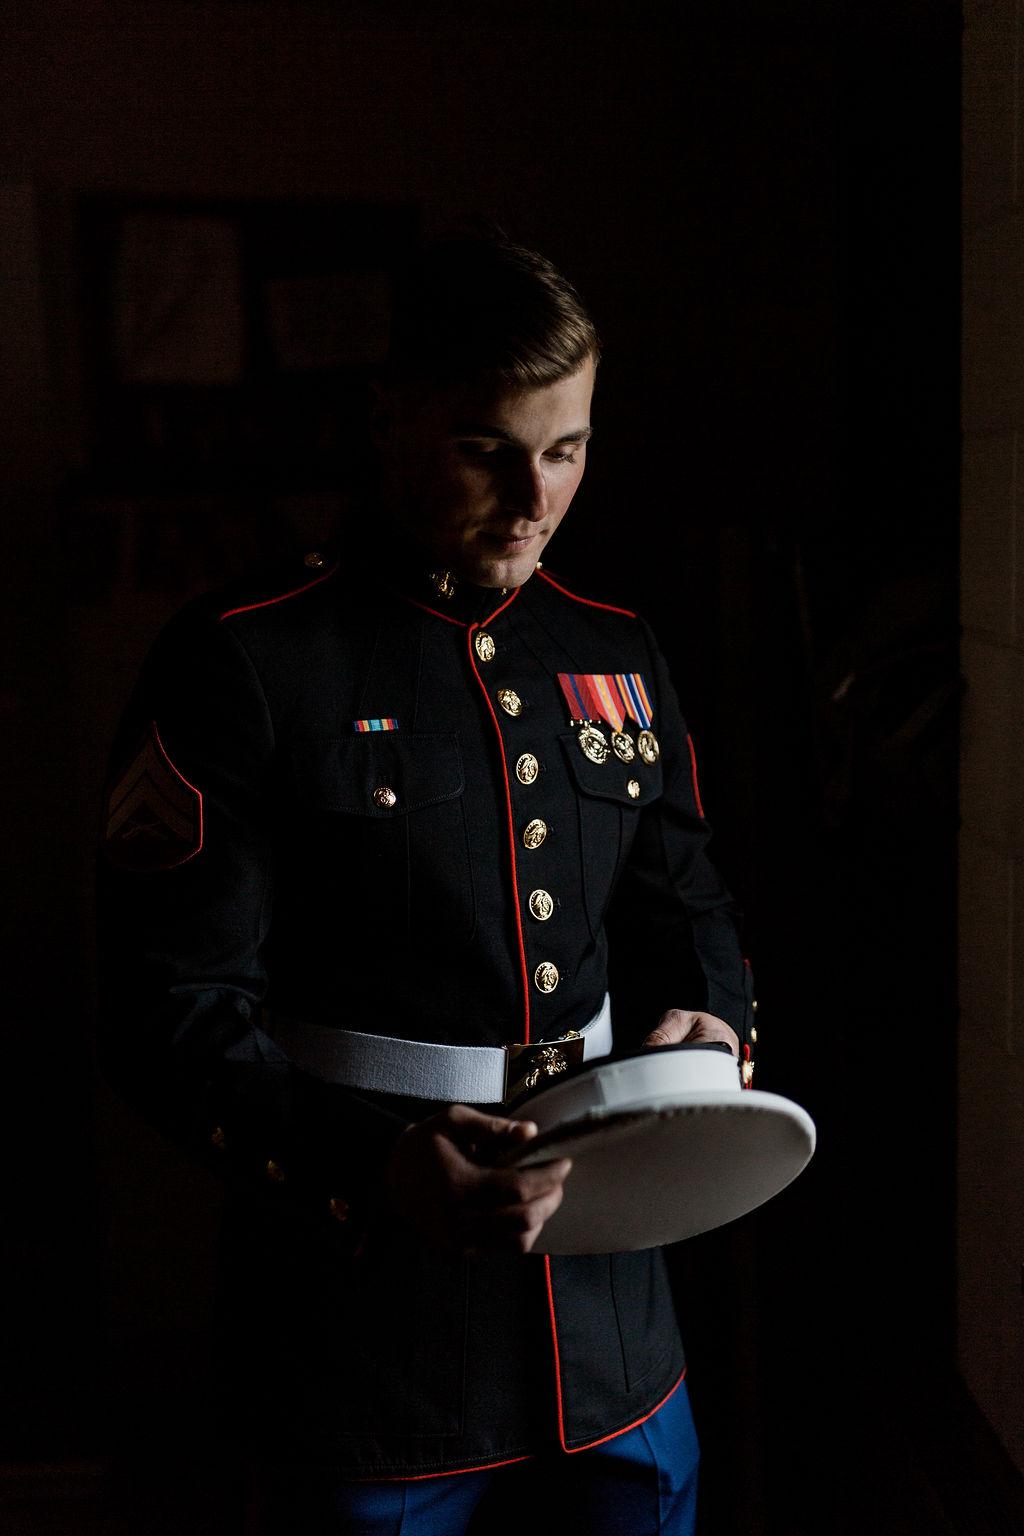 Marine_wedding_best_michigan_wedding_photographer_-26.jpg